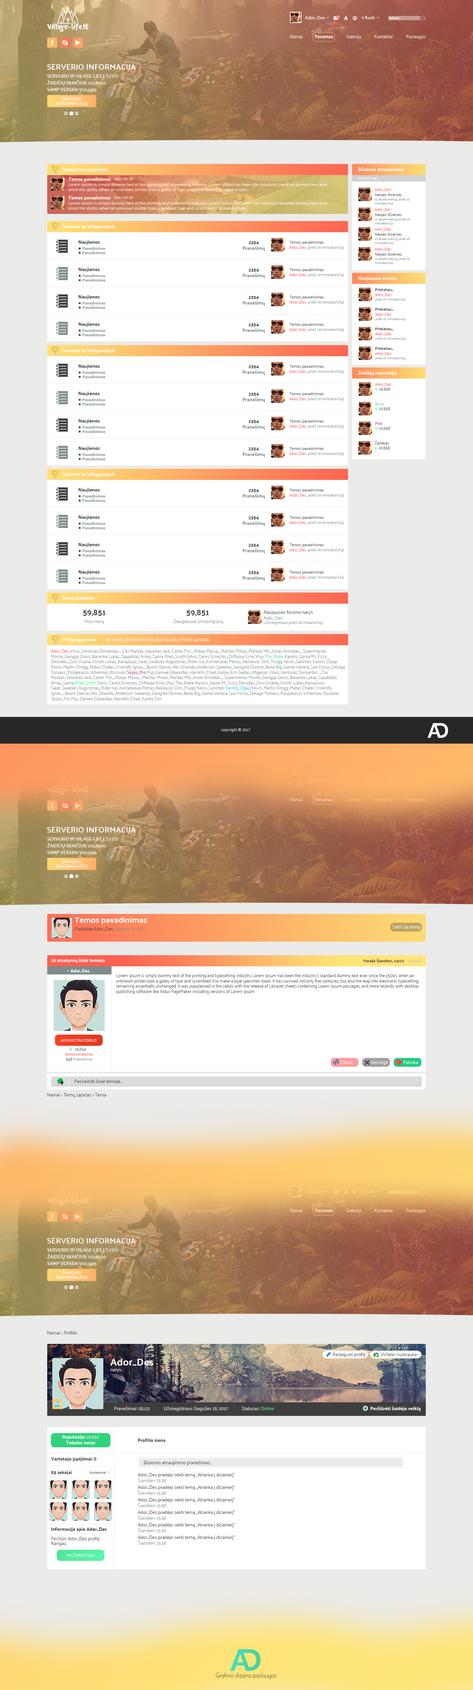 Gta-Samp-ips-web-design by Adordesign